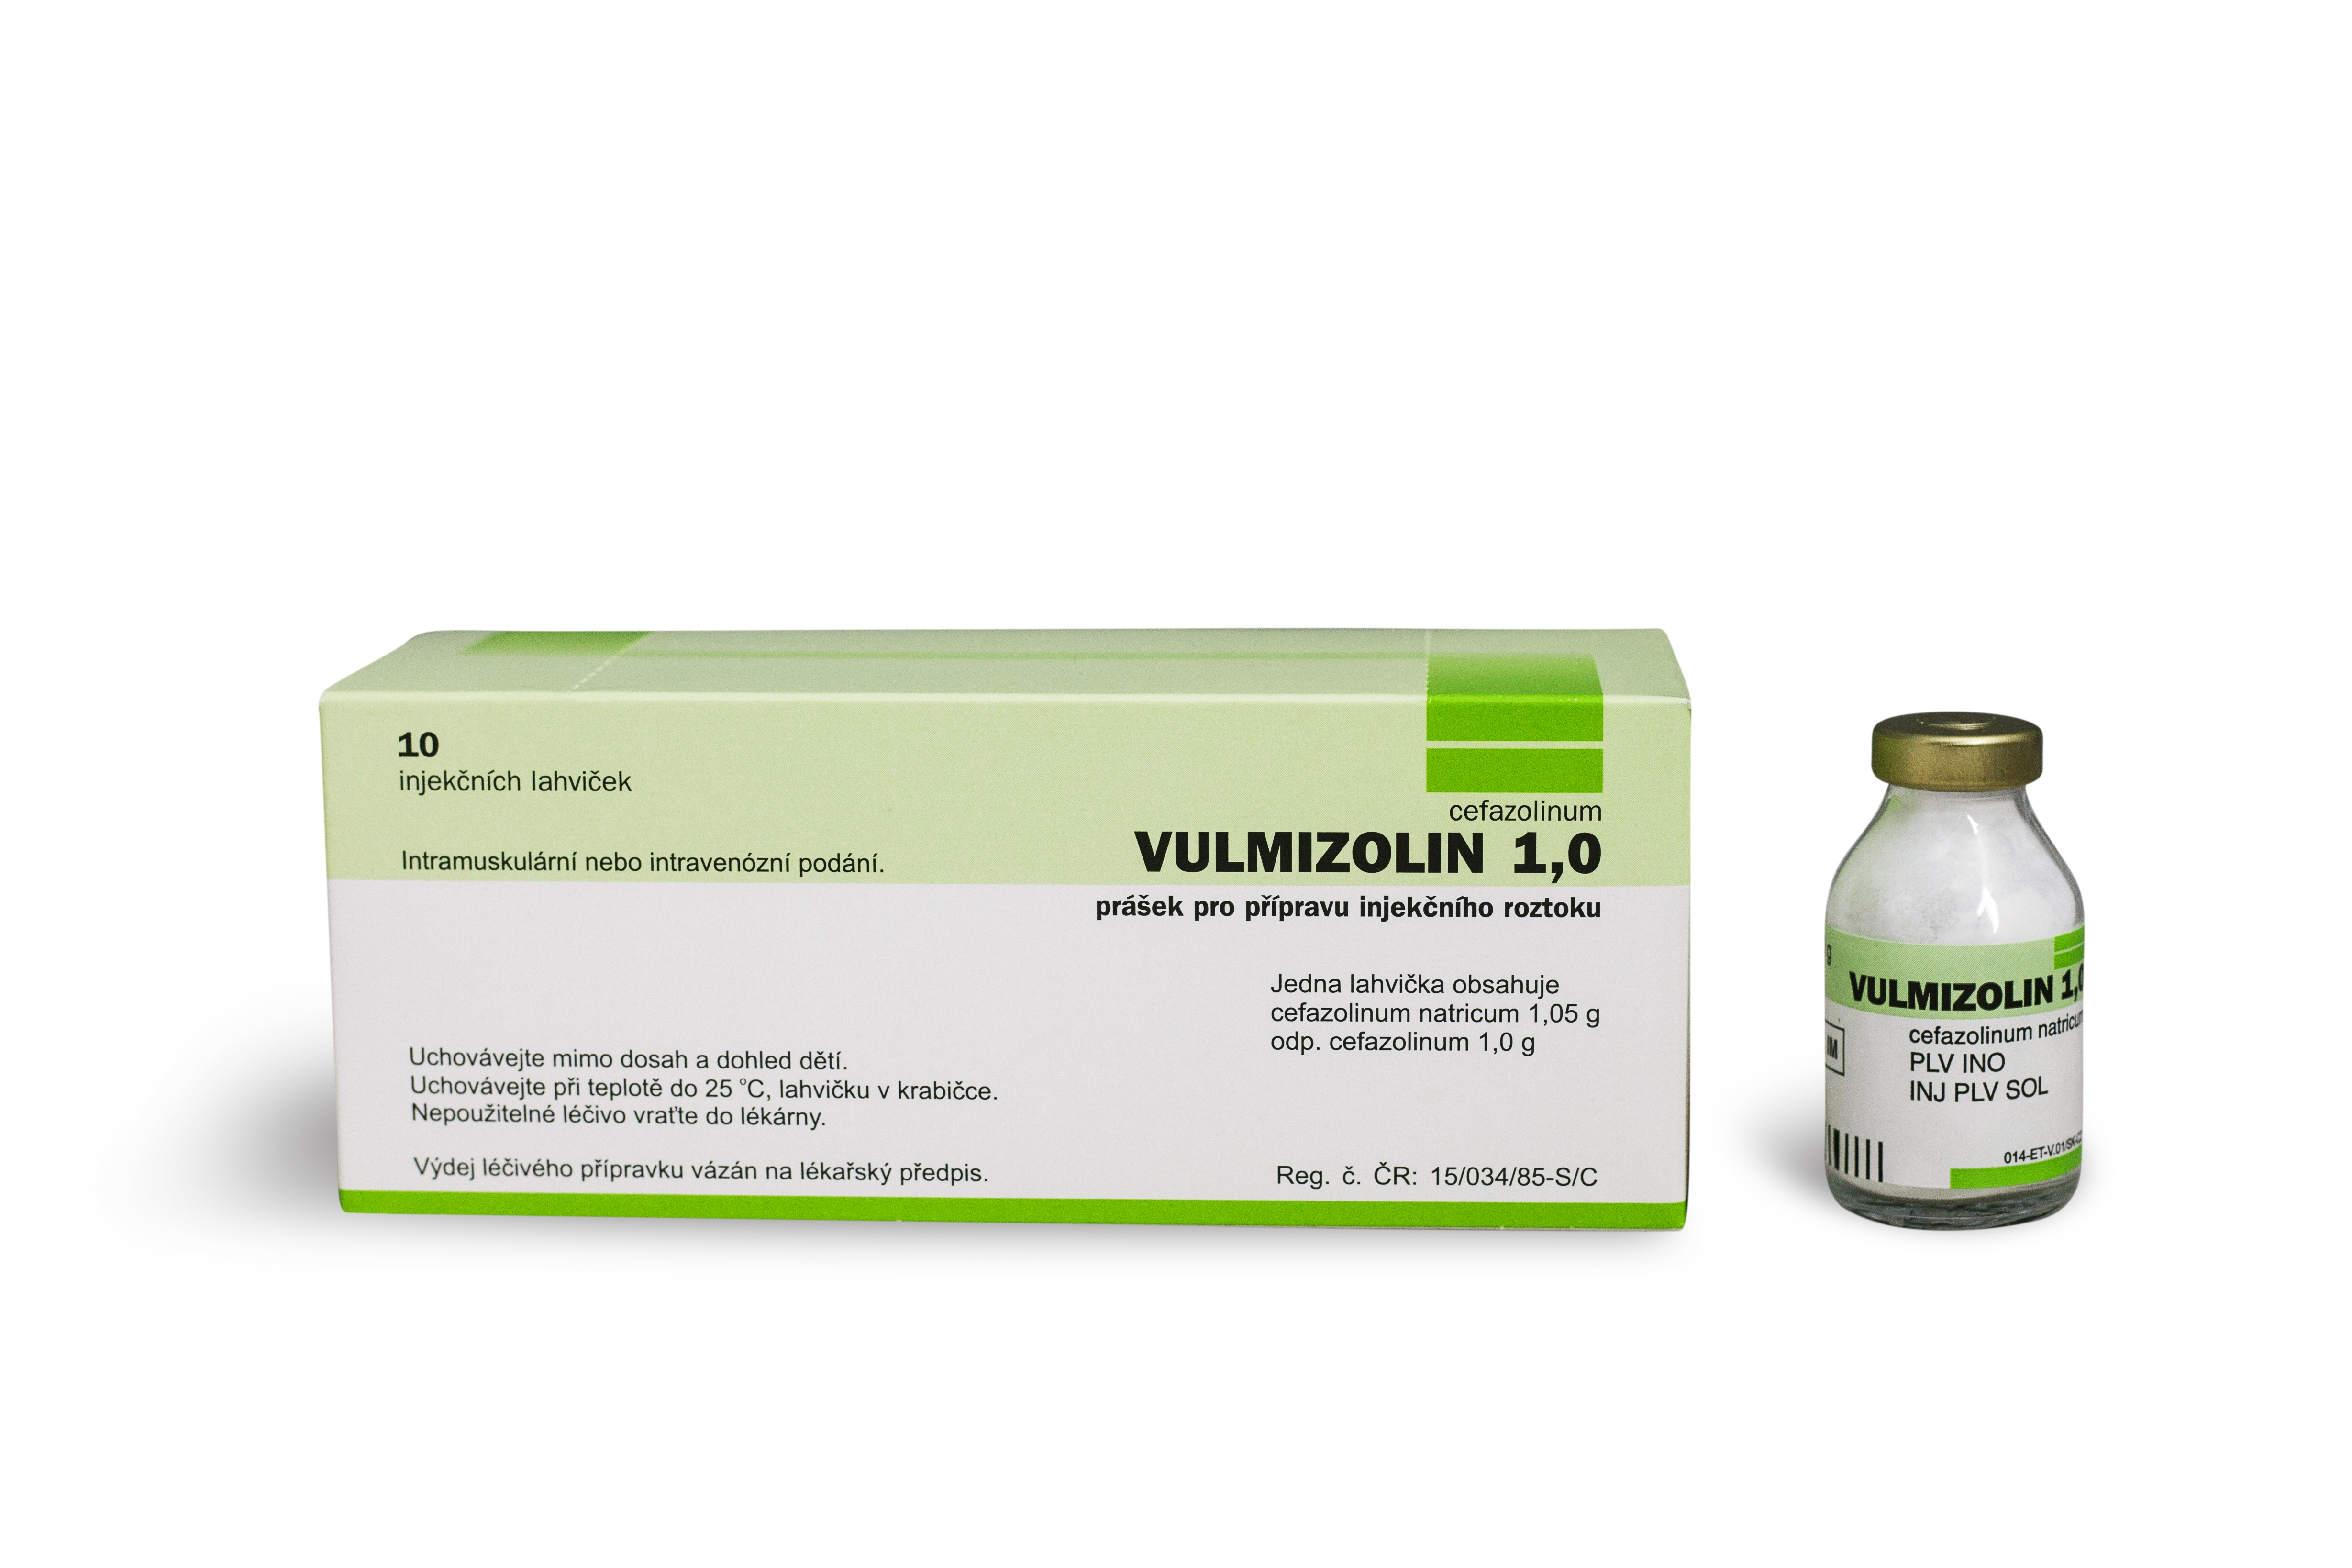 Vulmizolin